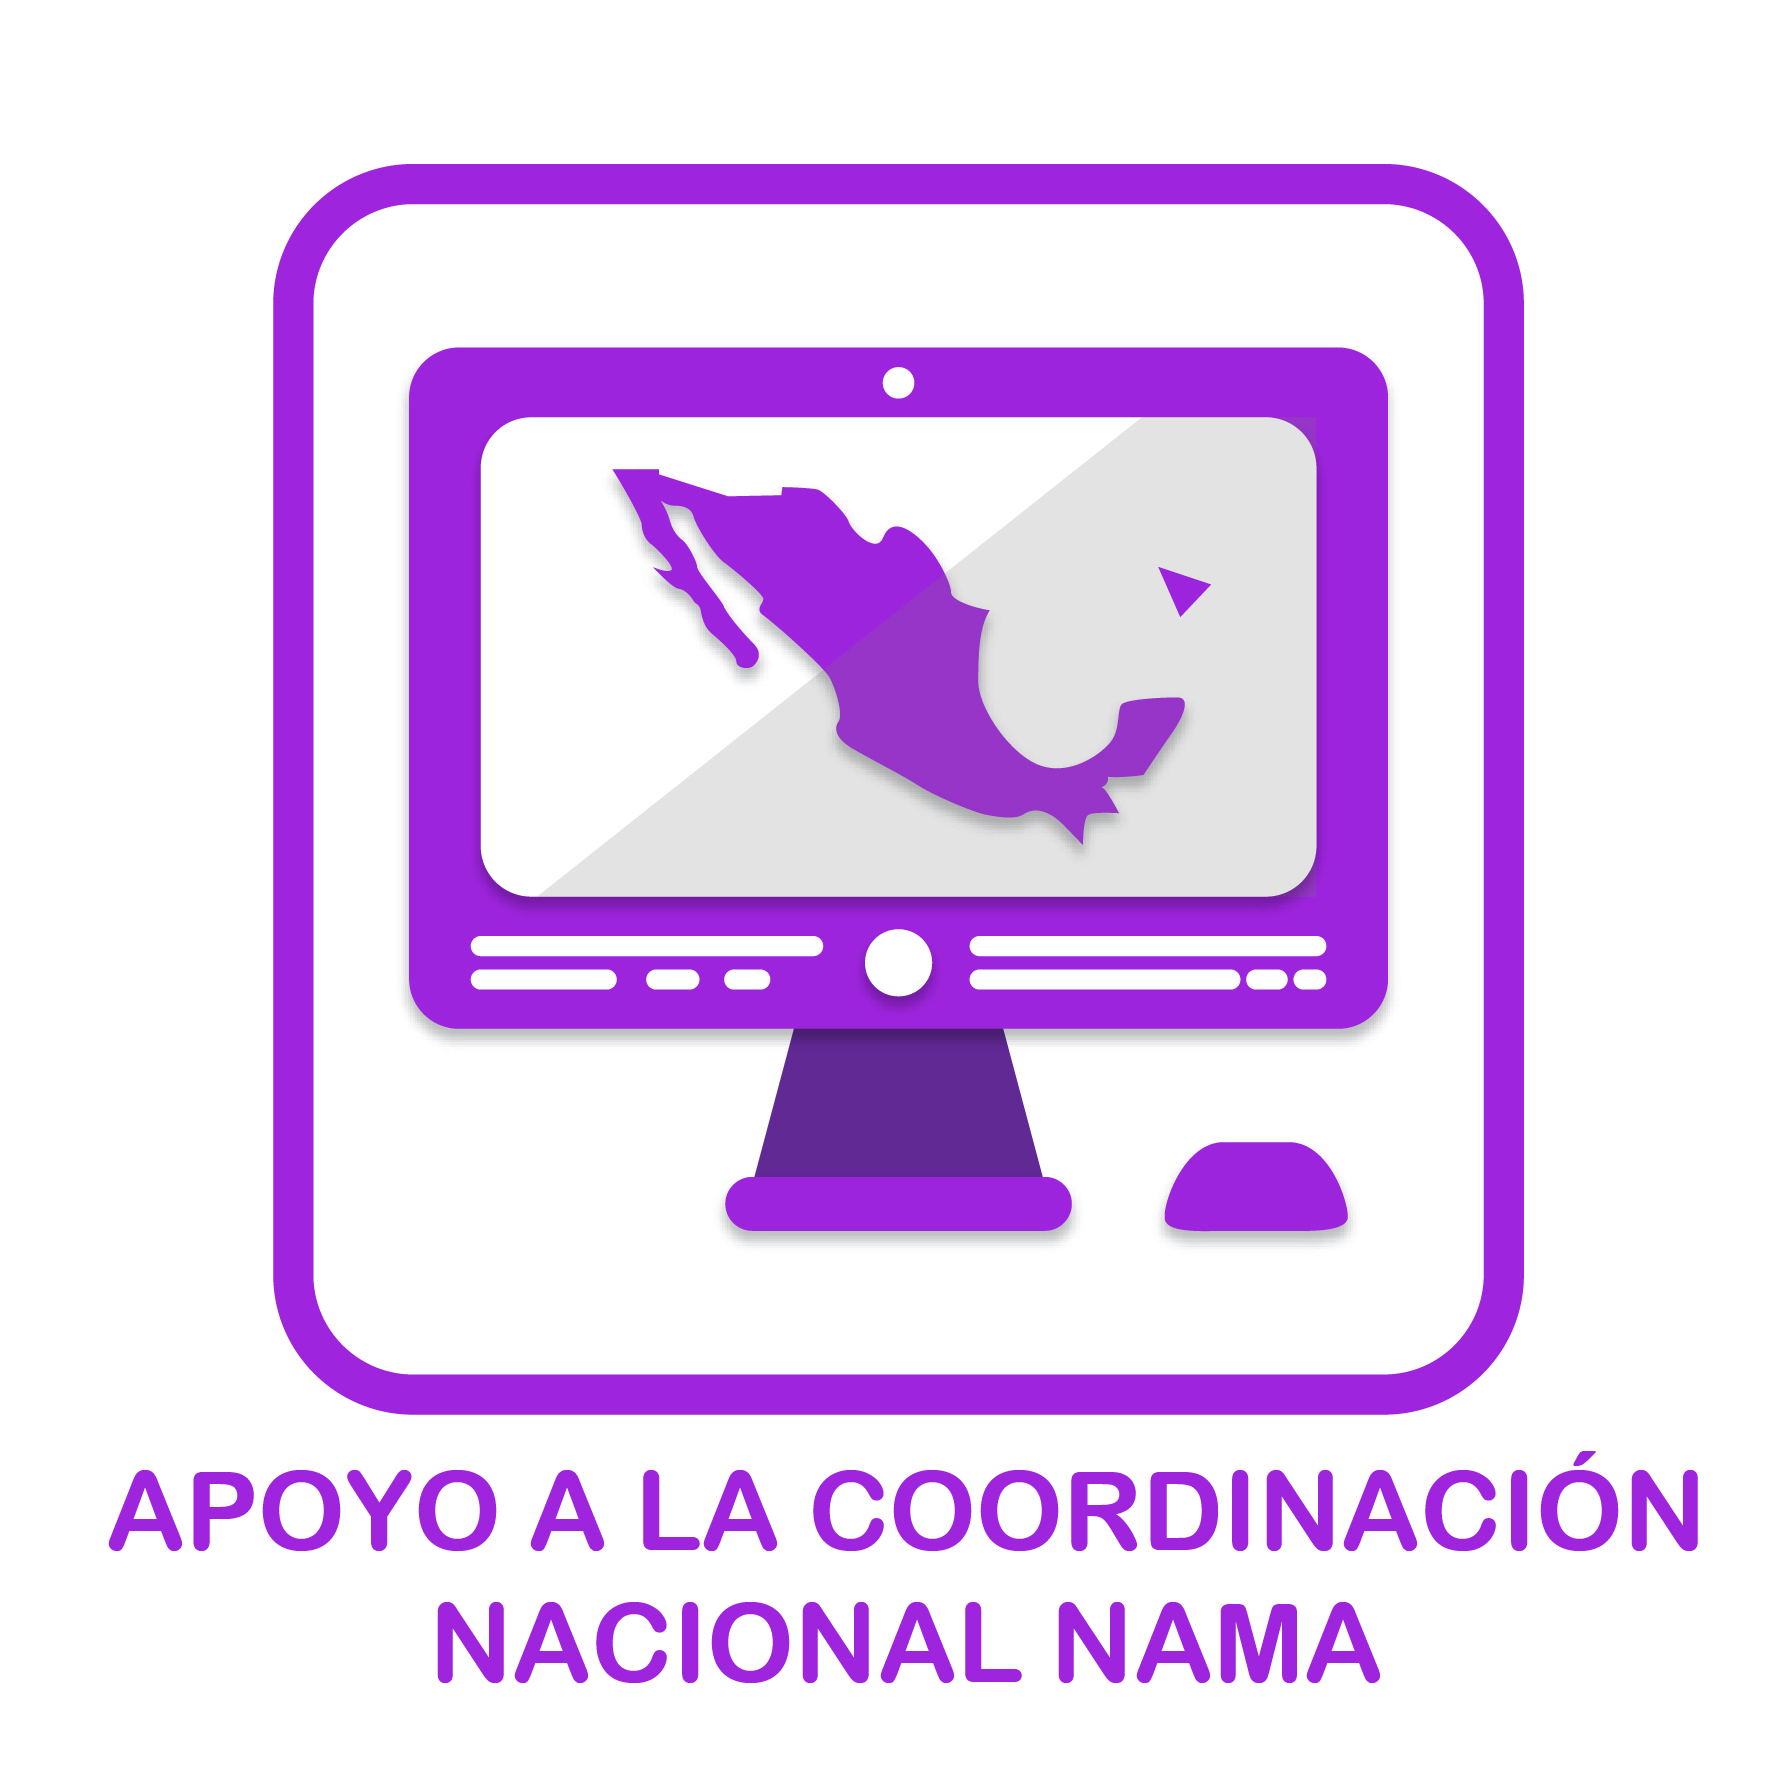 Icon of 05 Apoyo coordinación nacional NAMA